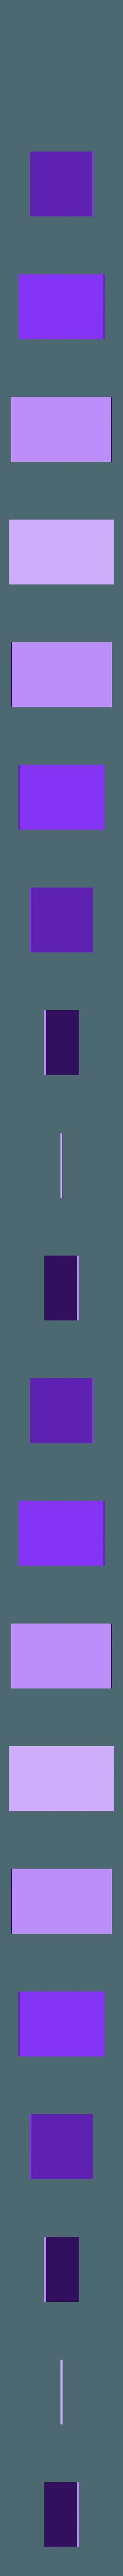 pol'3.STL Download free STL file # LIFEHACK3D-cajamuchiforma • Model to 3D print, izanferrco